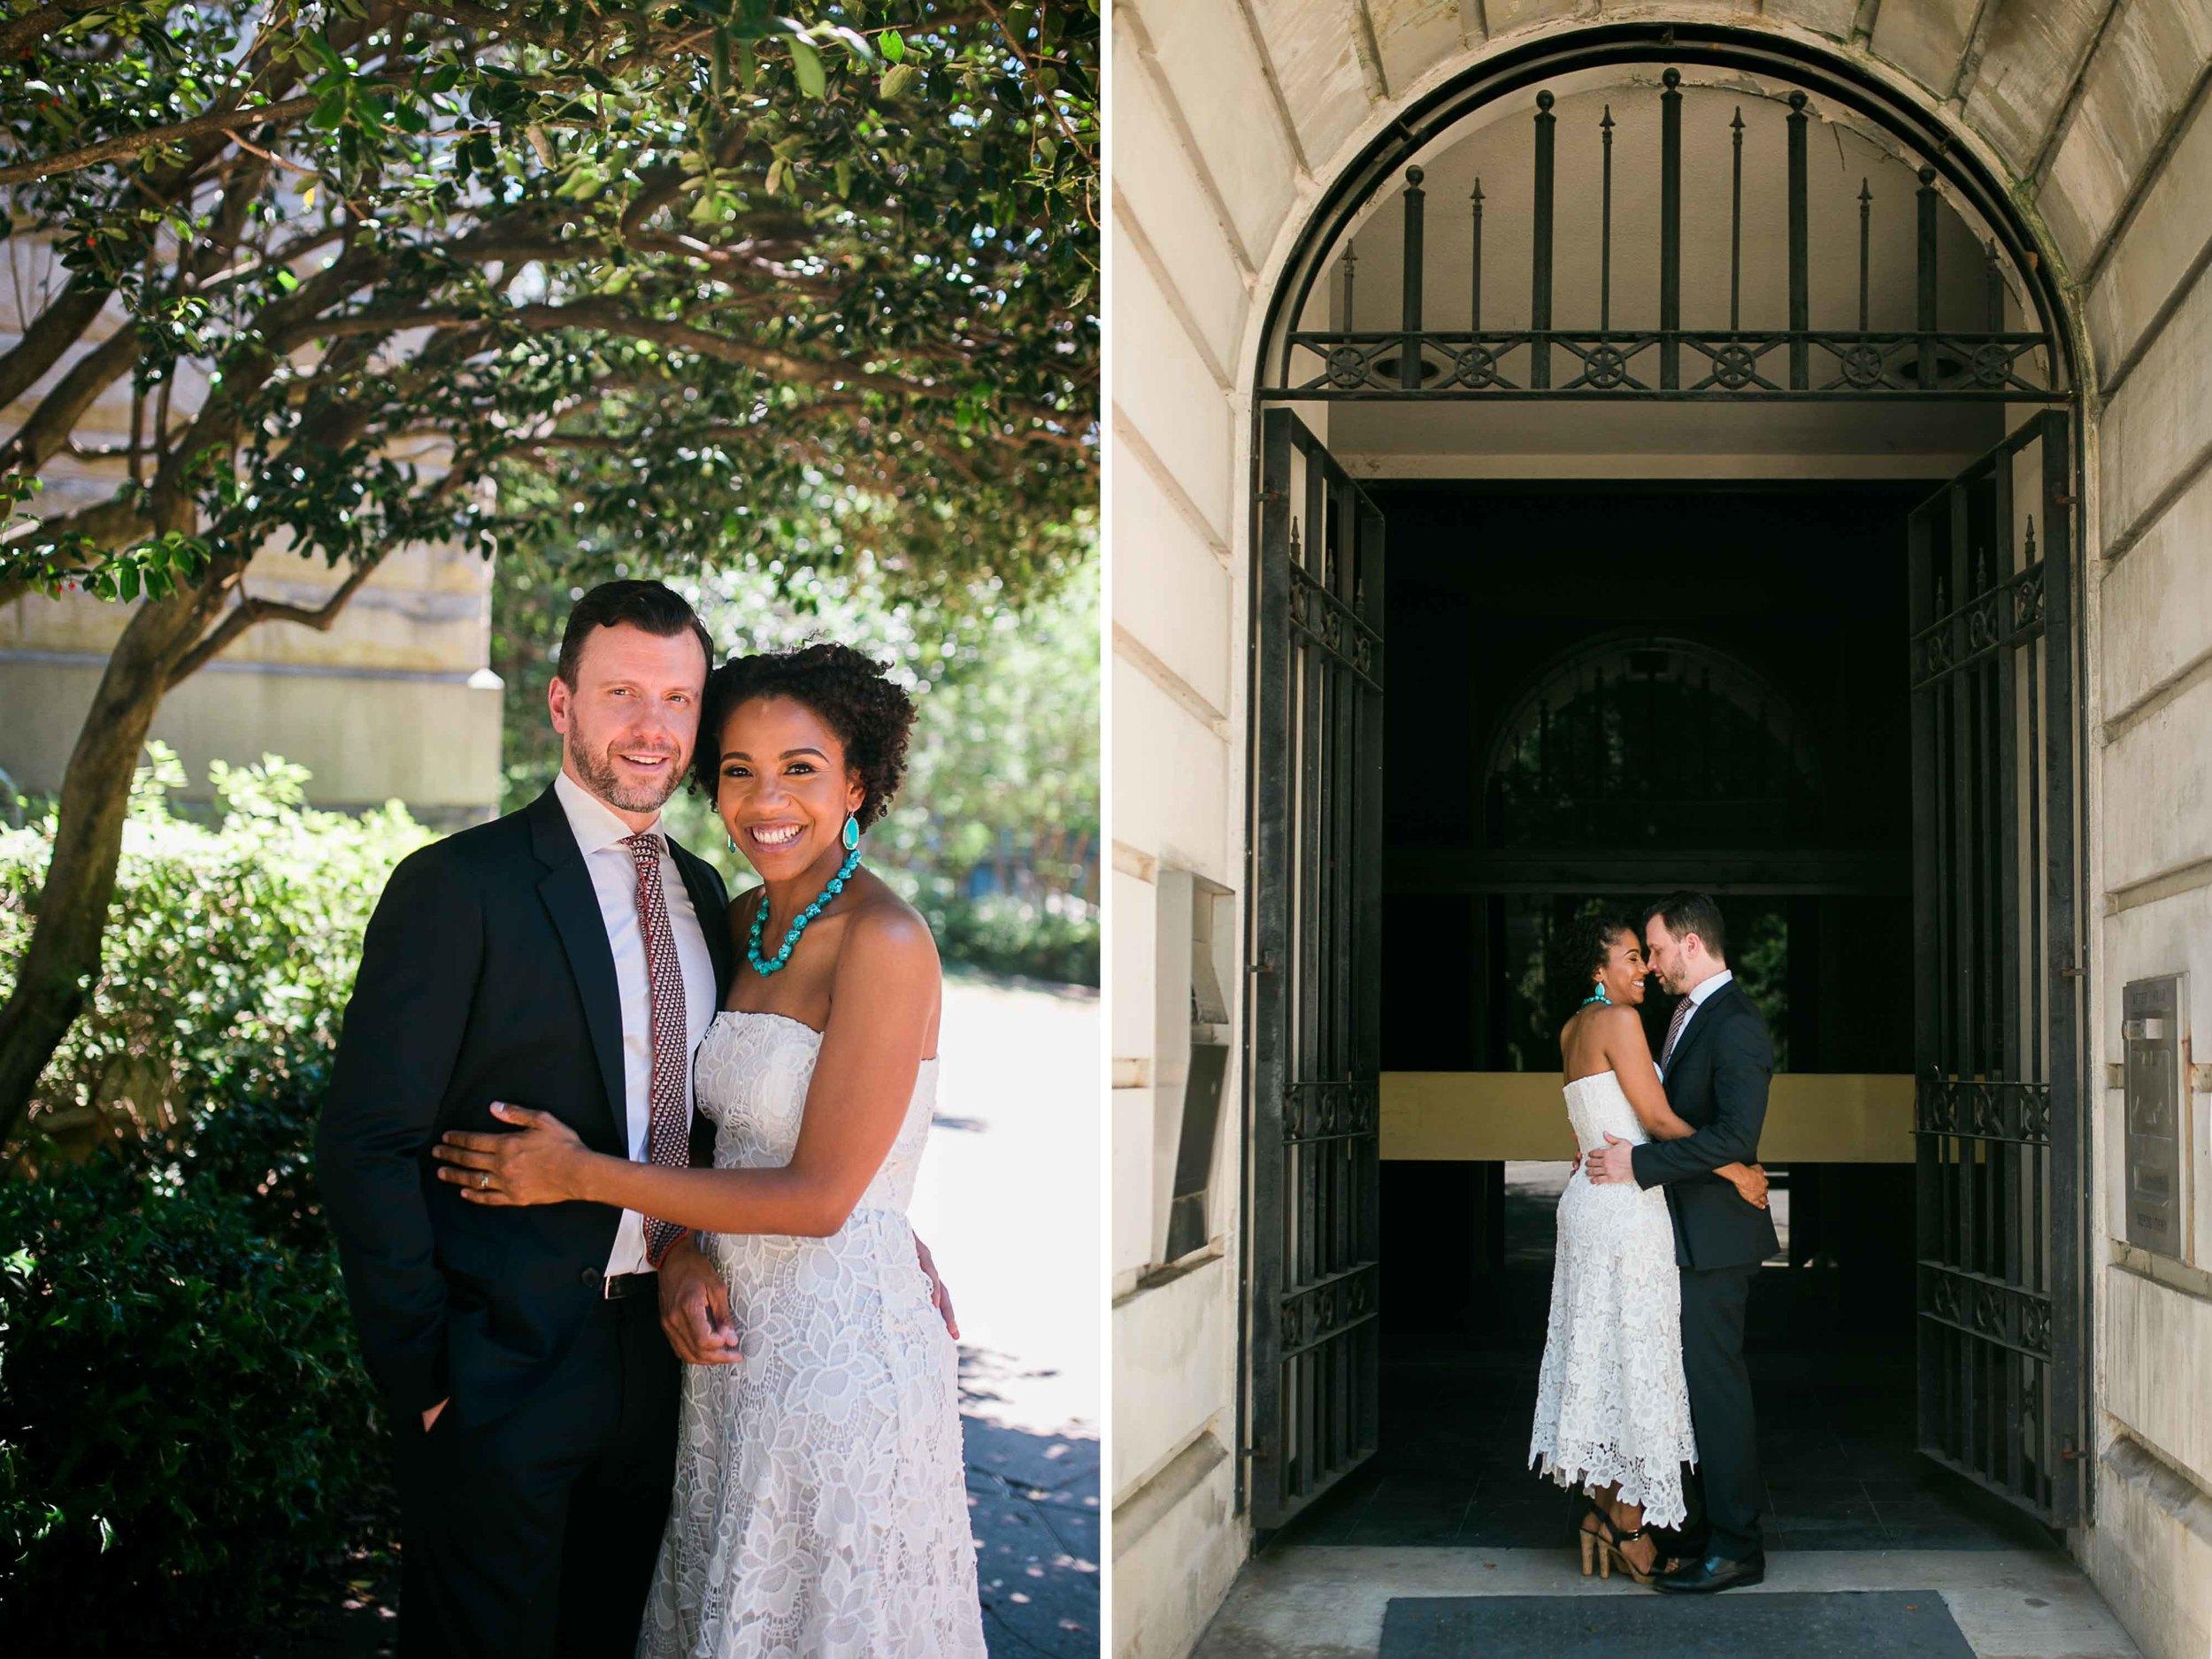 Dekalb-County-Courthouse-Wedding-Photos-Kiyah-C-Photography-75.jpg